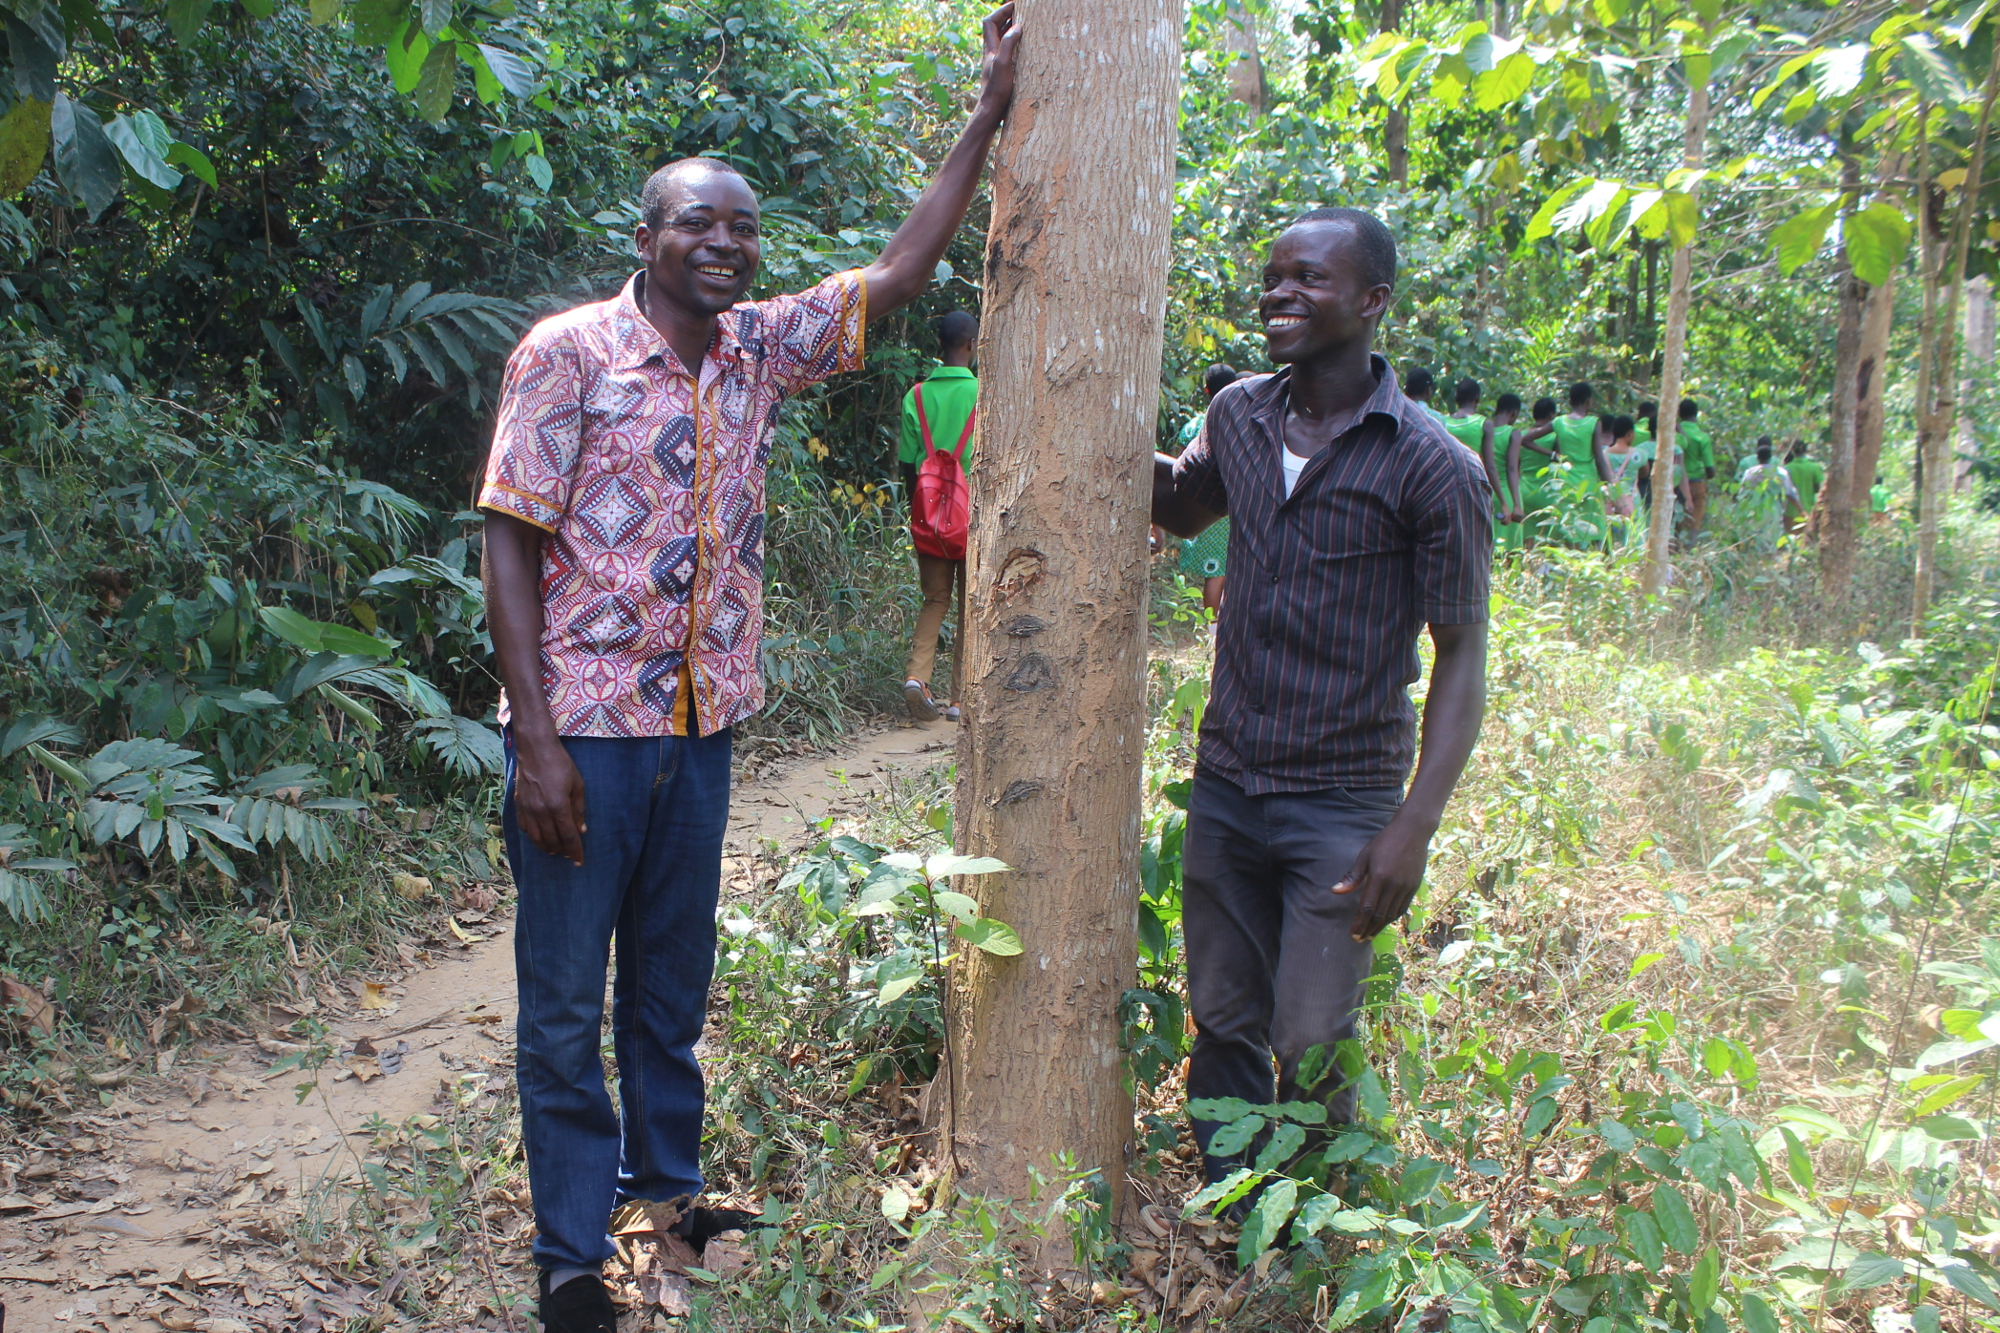 Ghana trees - Climate Stewards